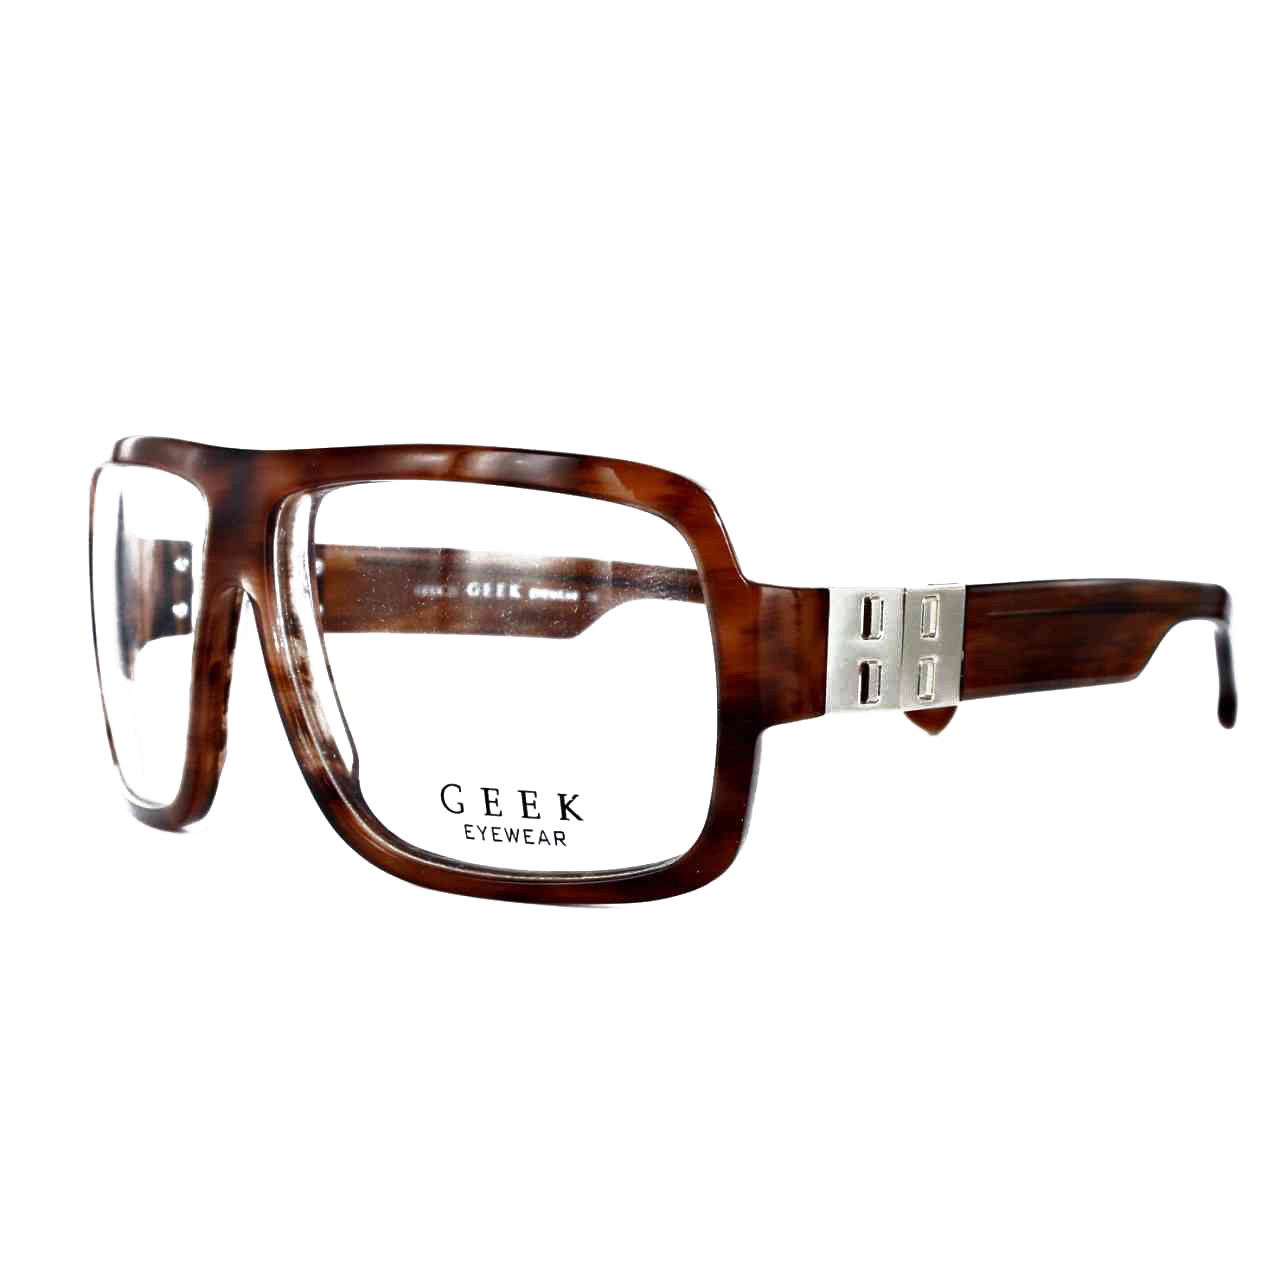 GEEK Eyewear GEEK 21